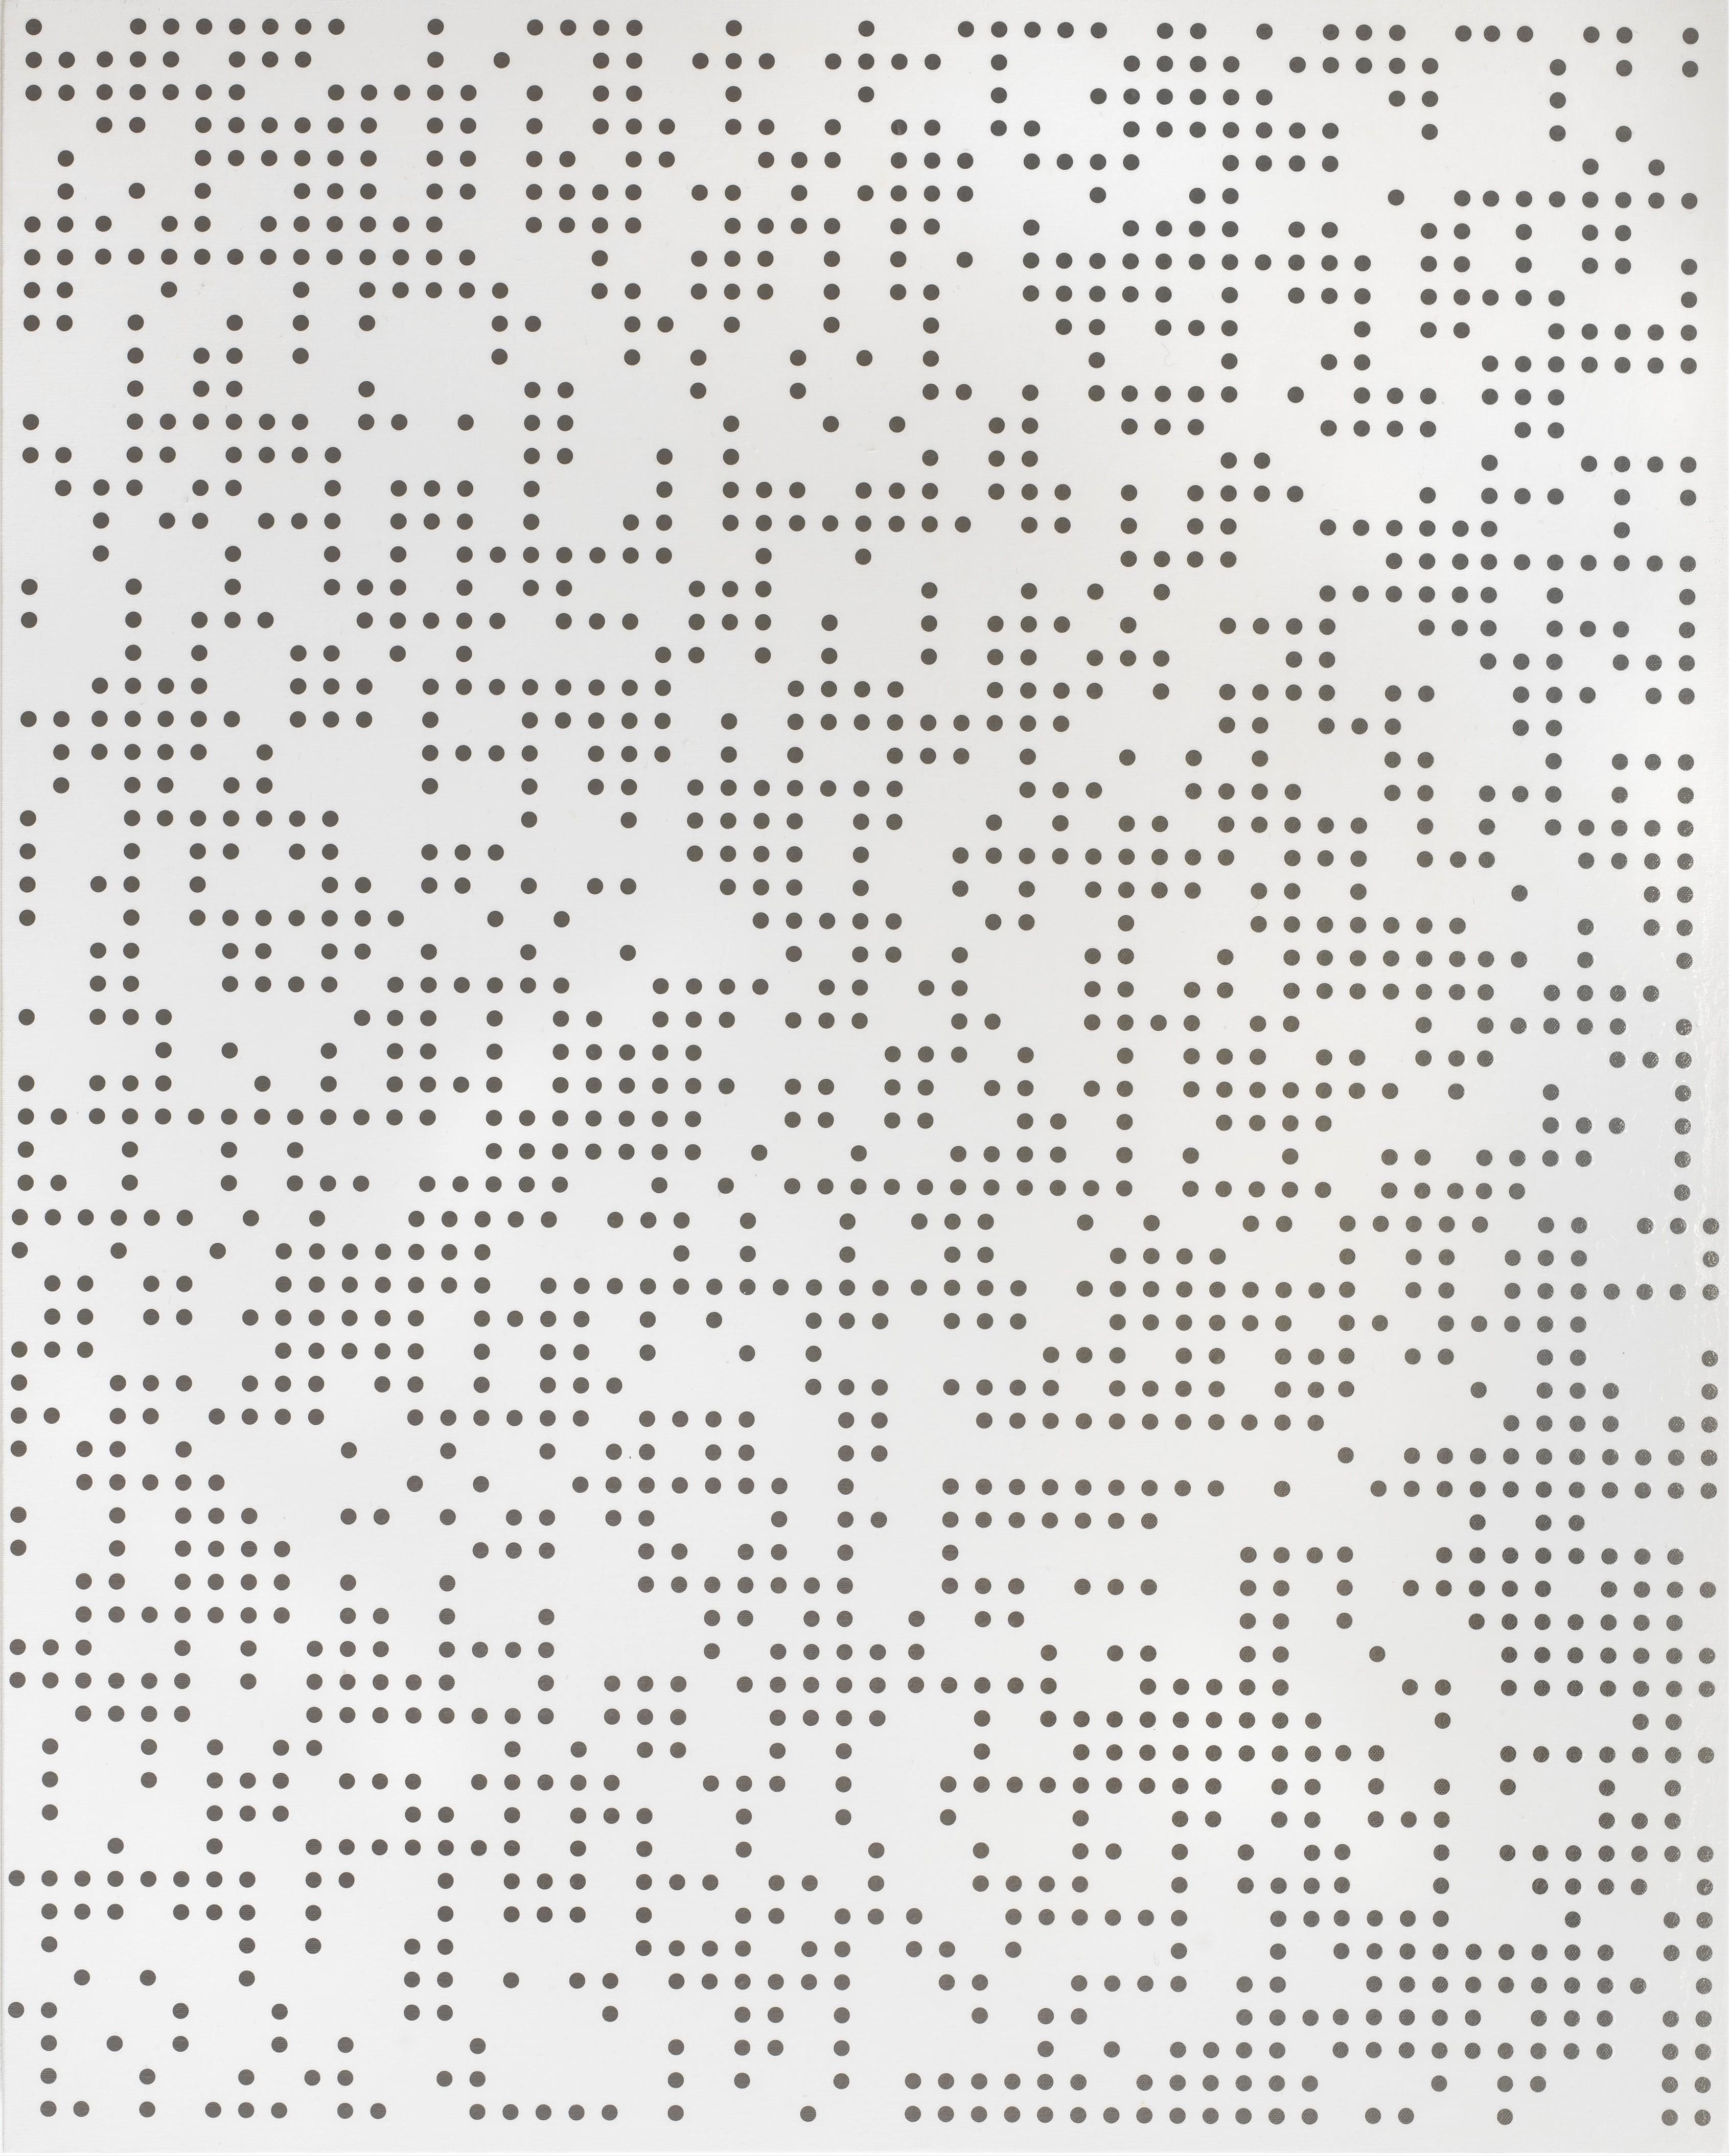 ENCODING 2015, Acrylic on canvas, 116.8x91cm (7)